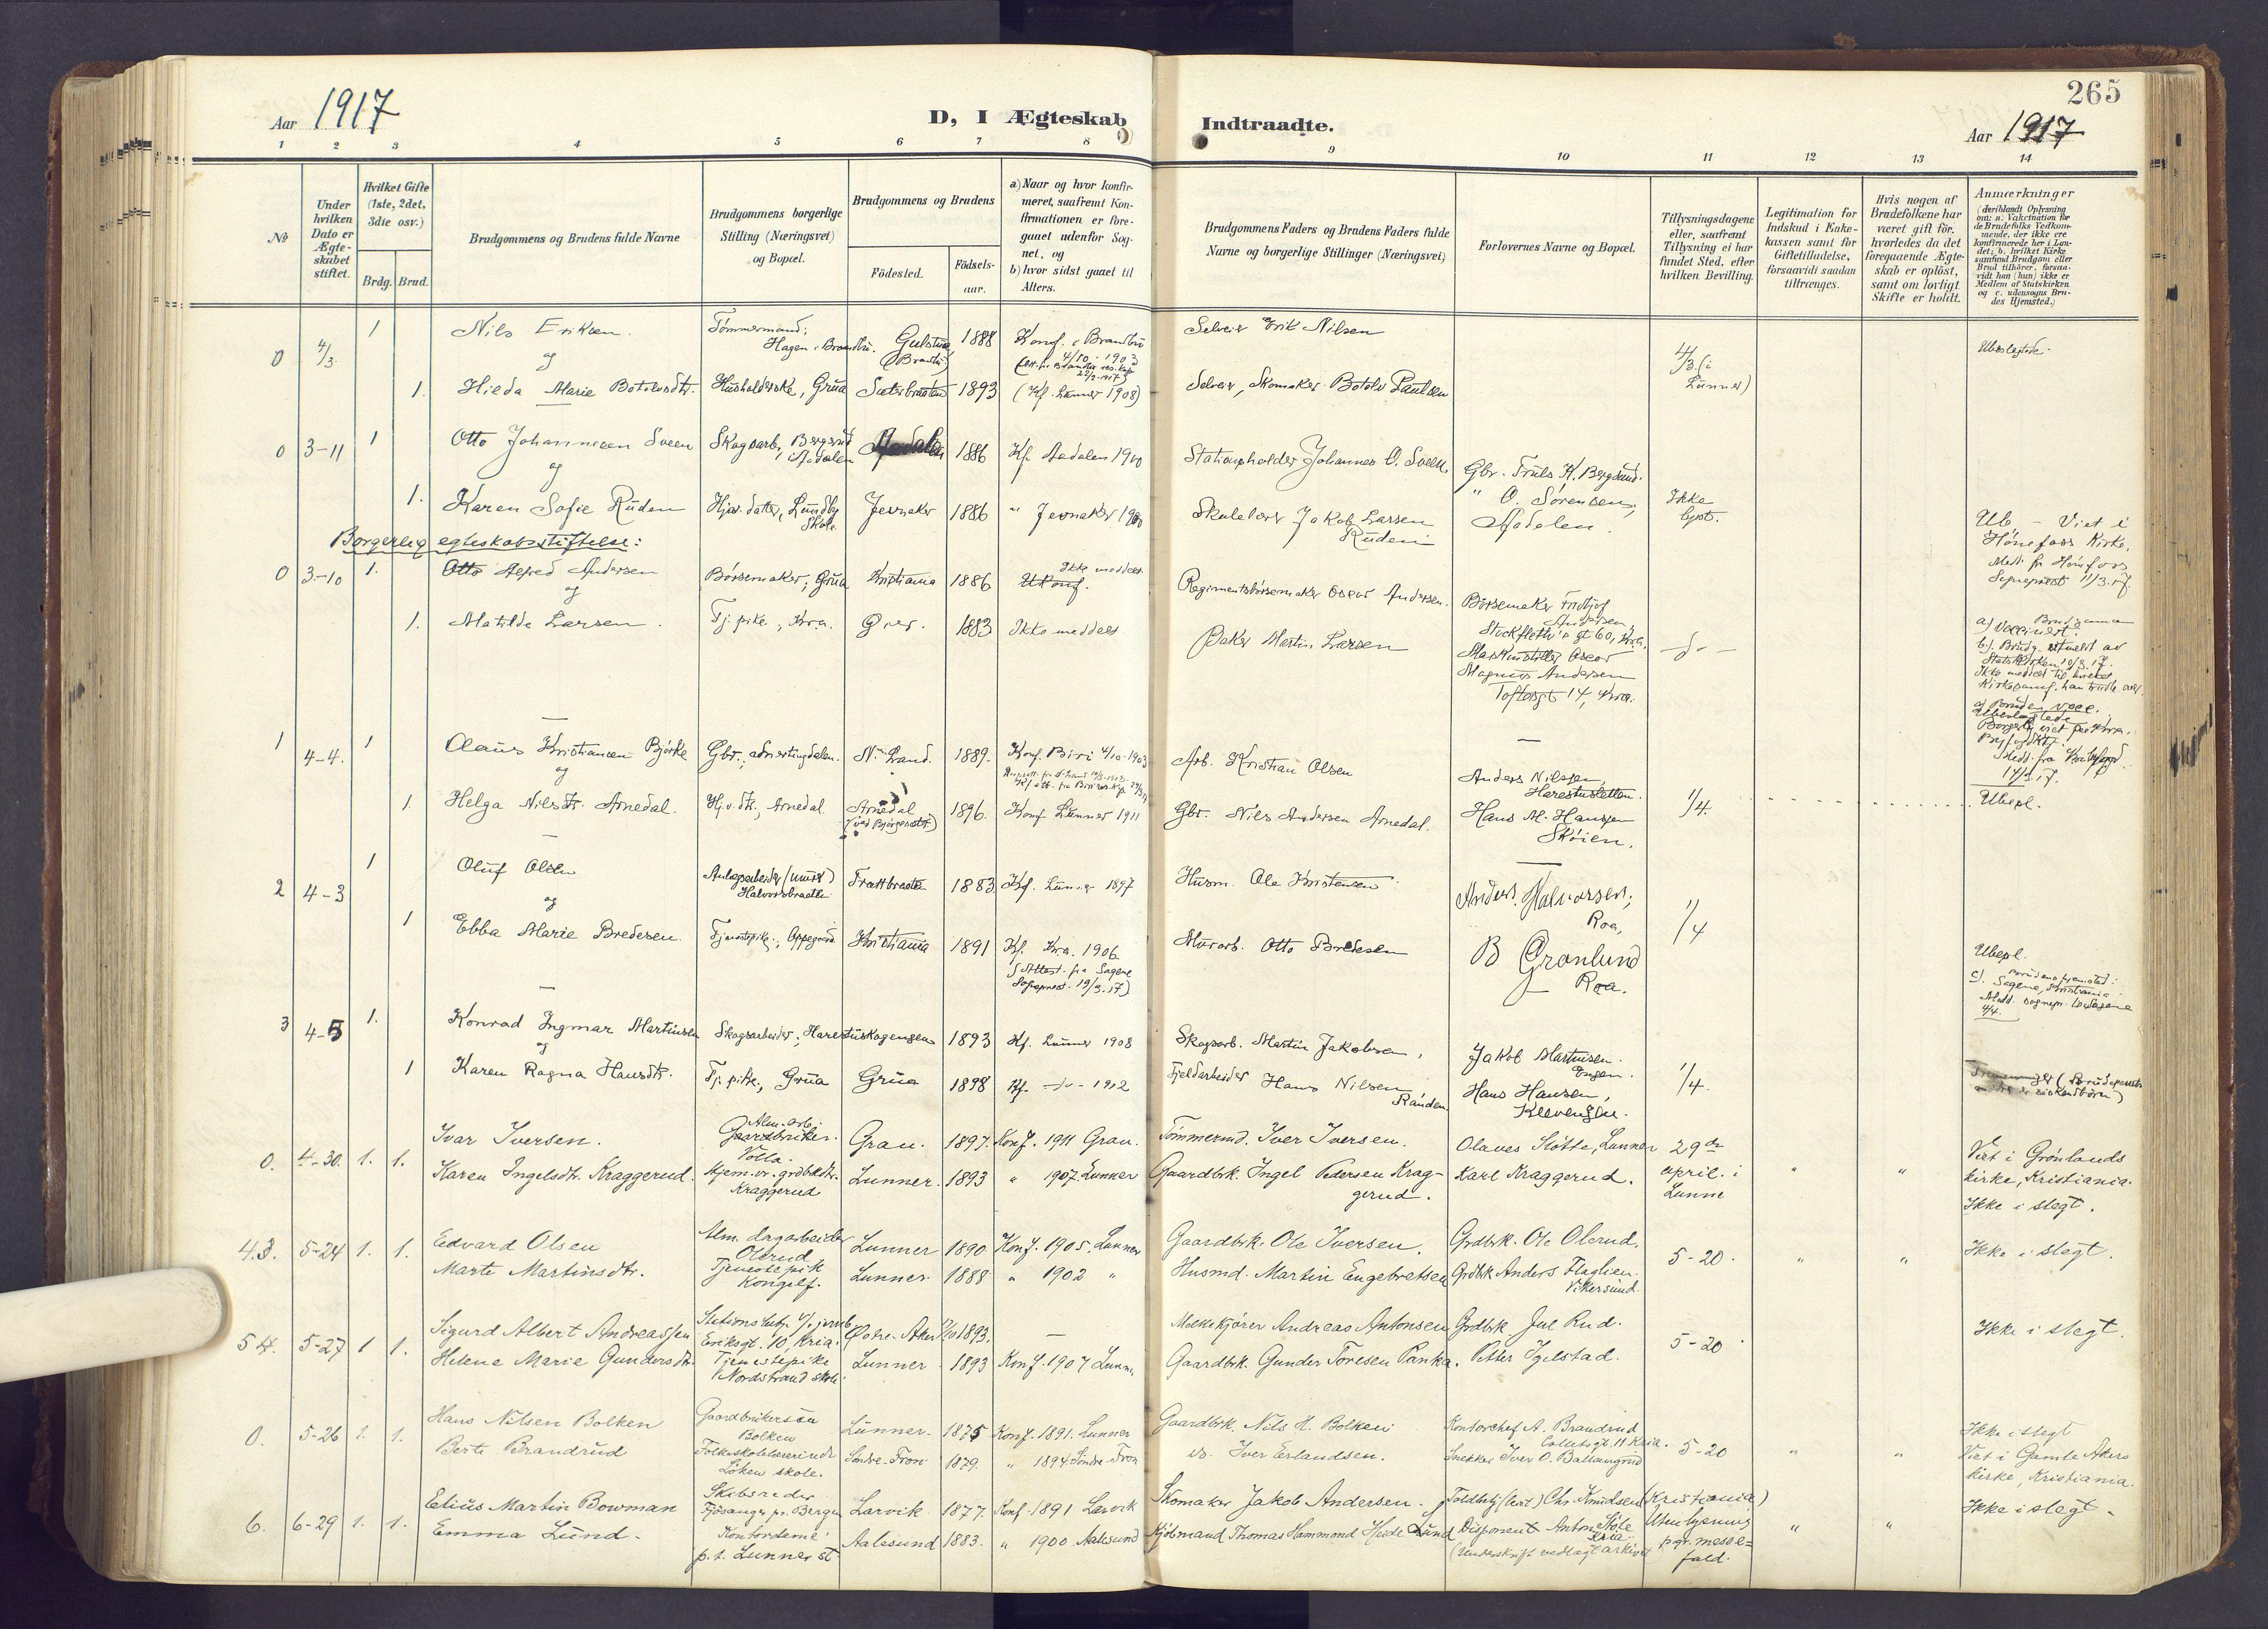 SAH, Lunner prestekontor, H/Ha/Haa/L0001: Ministerialbok nr. 1, 1907-1922, s. 265